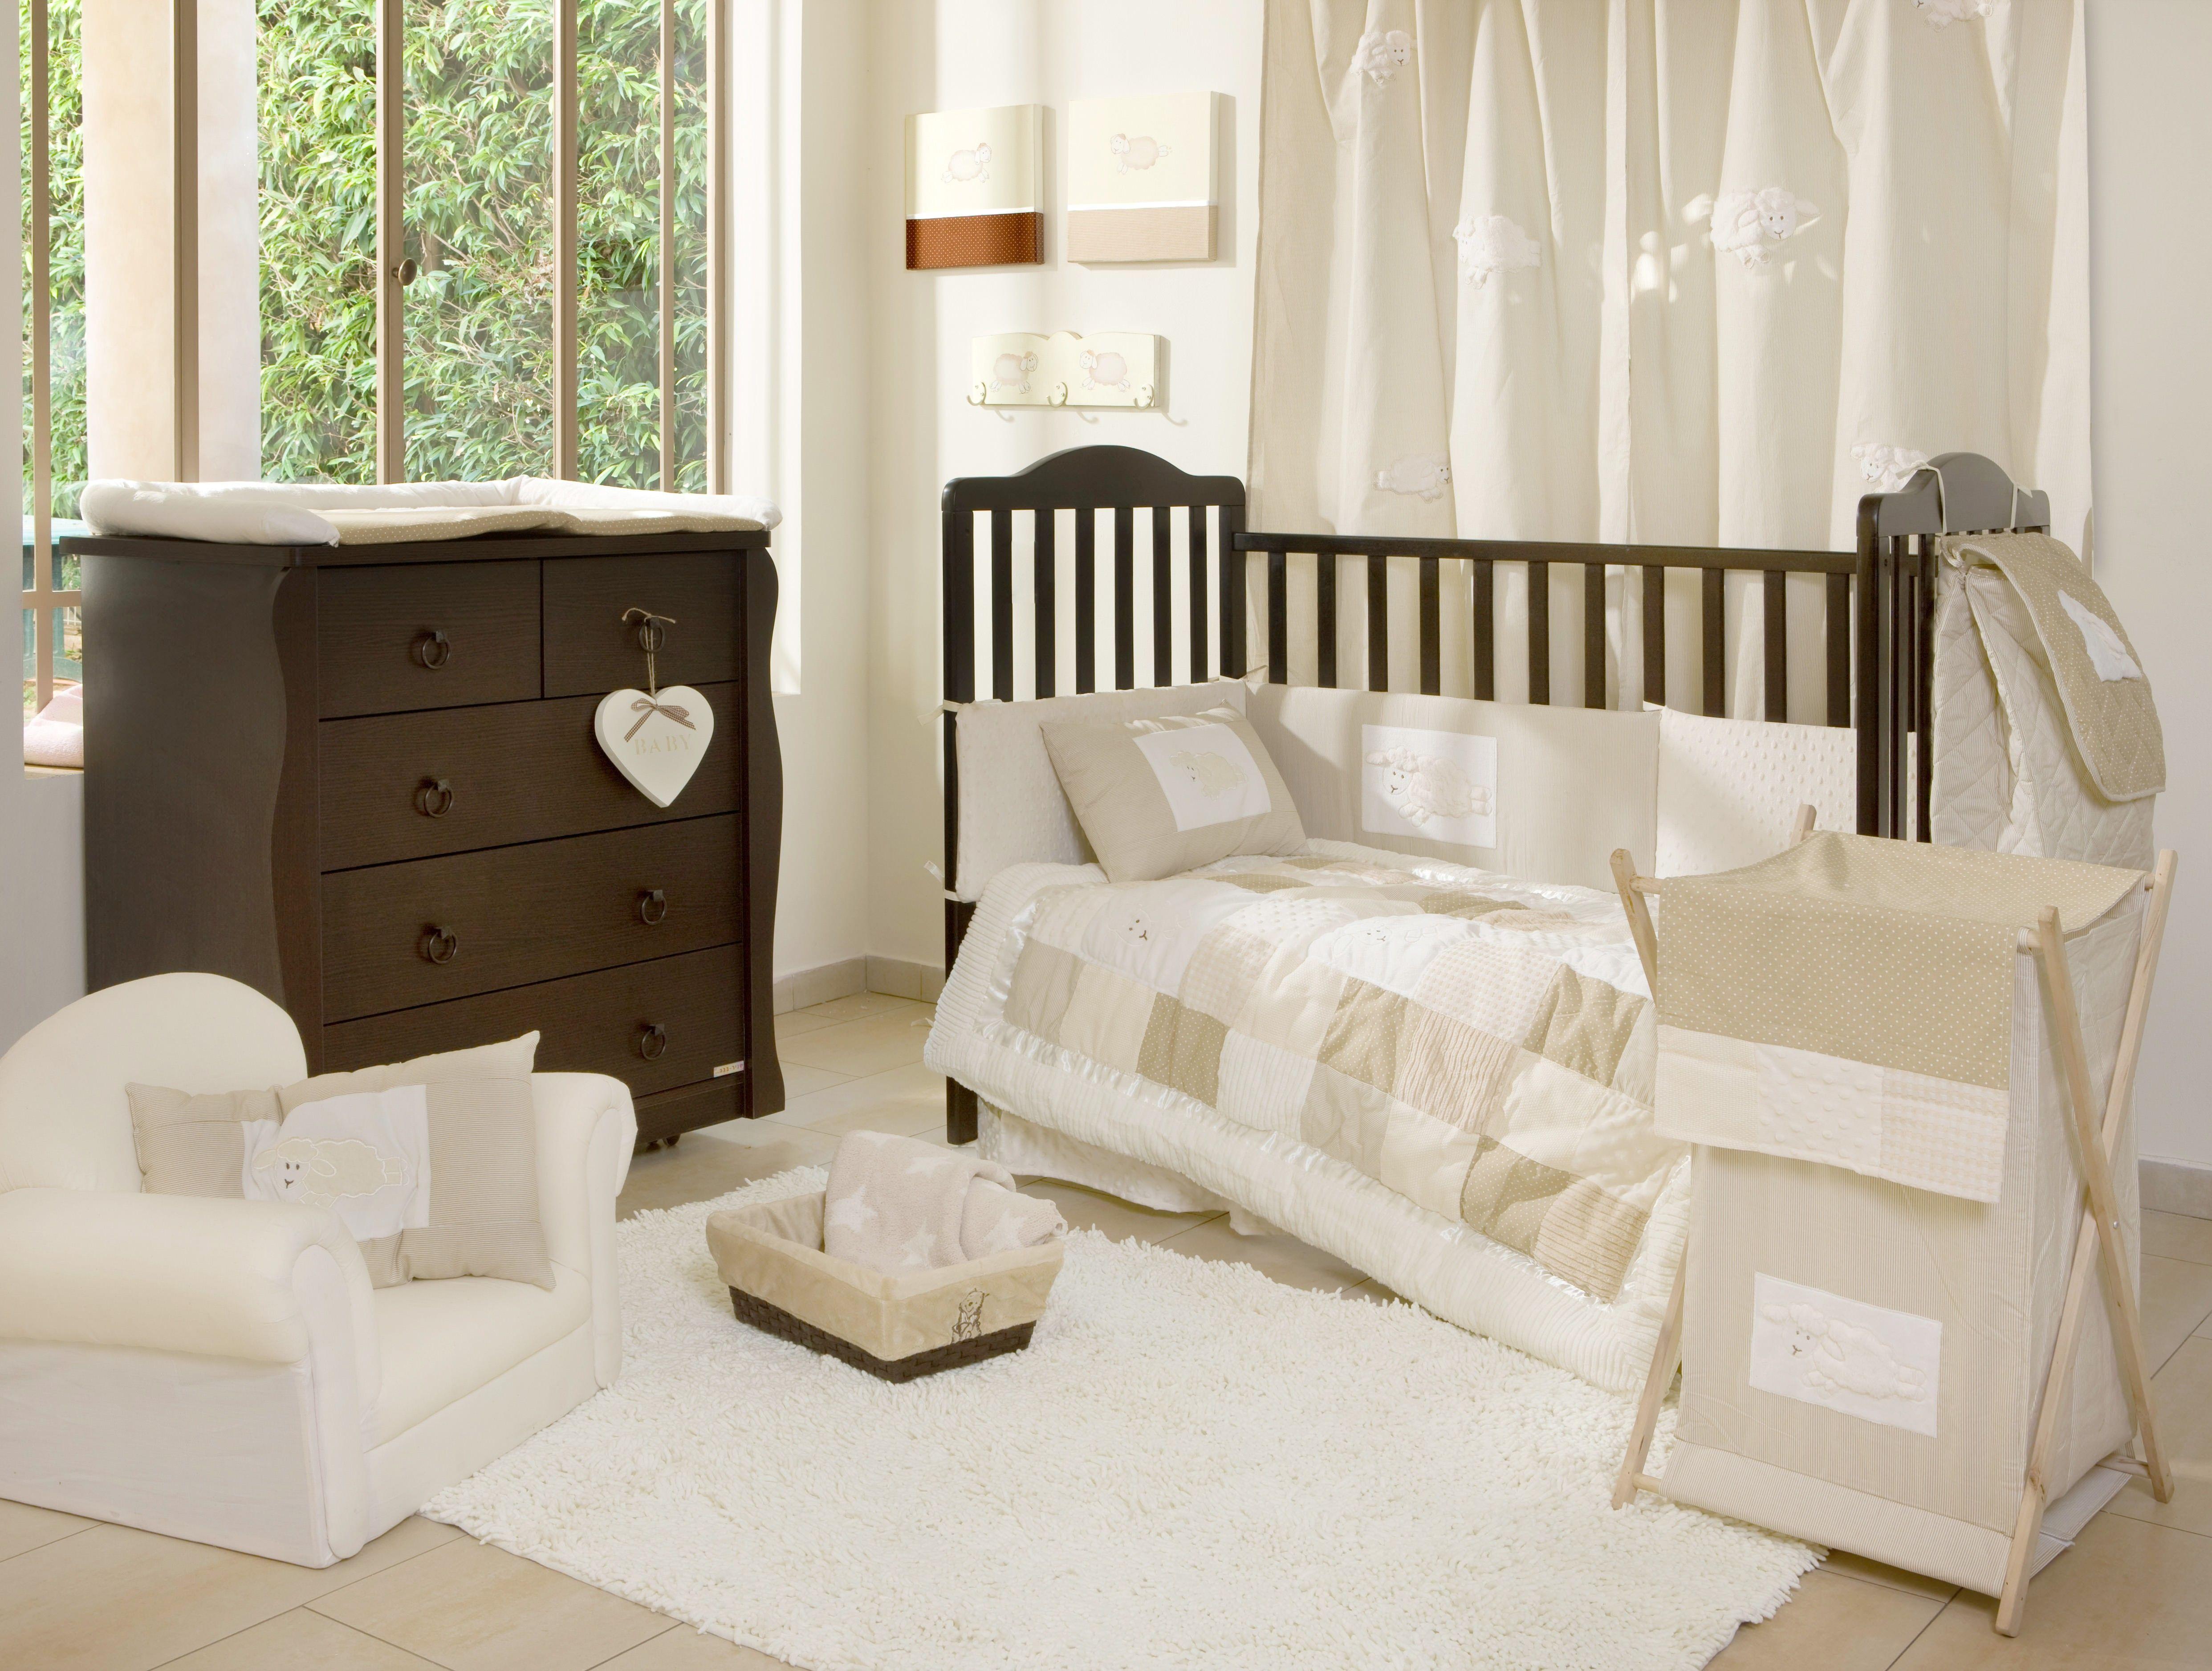 baby bedding sets cream sheeps crib bedding baby nursery bedding white crib bedding baby bedding sets girl crib bedding sets